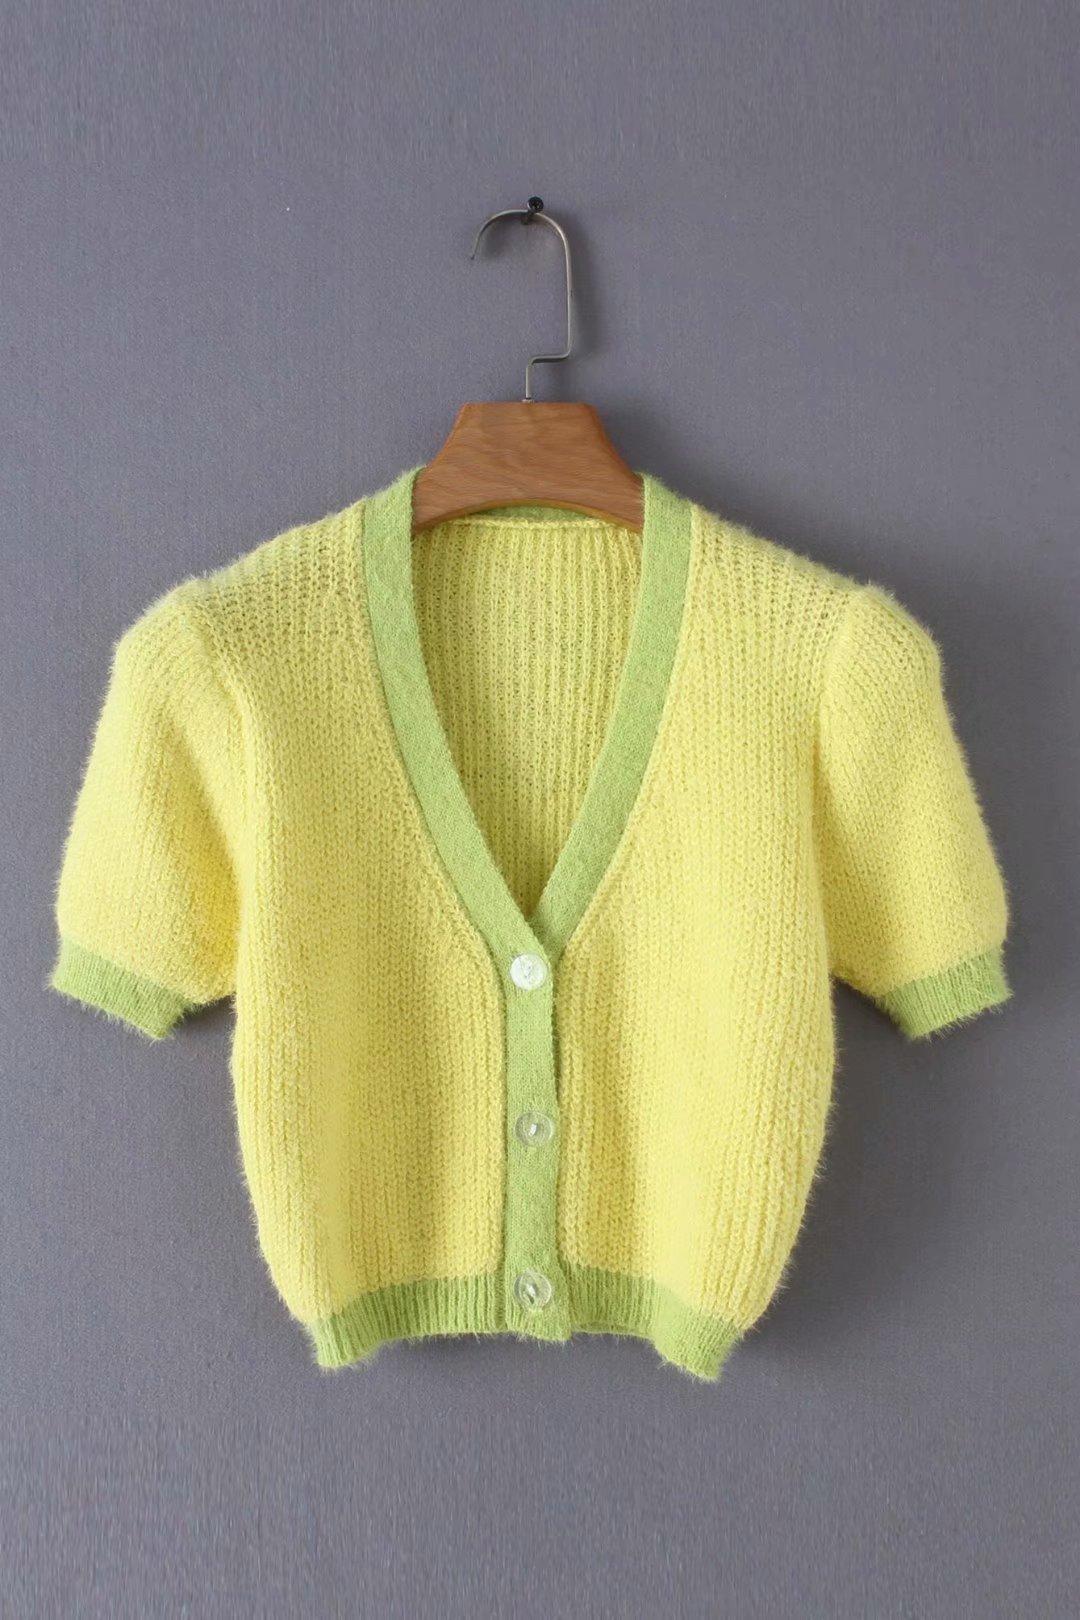 Pink cardigan womens sweaters korean crop sweater yellow autumn tops short sleeve v neck short cardigan mohair sweater fall 19 10